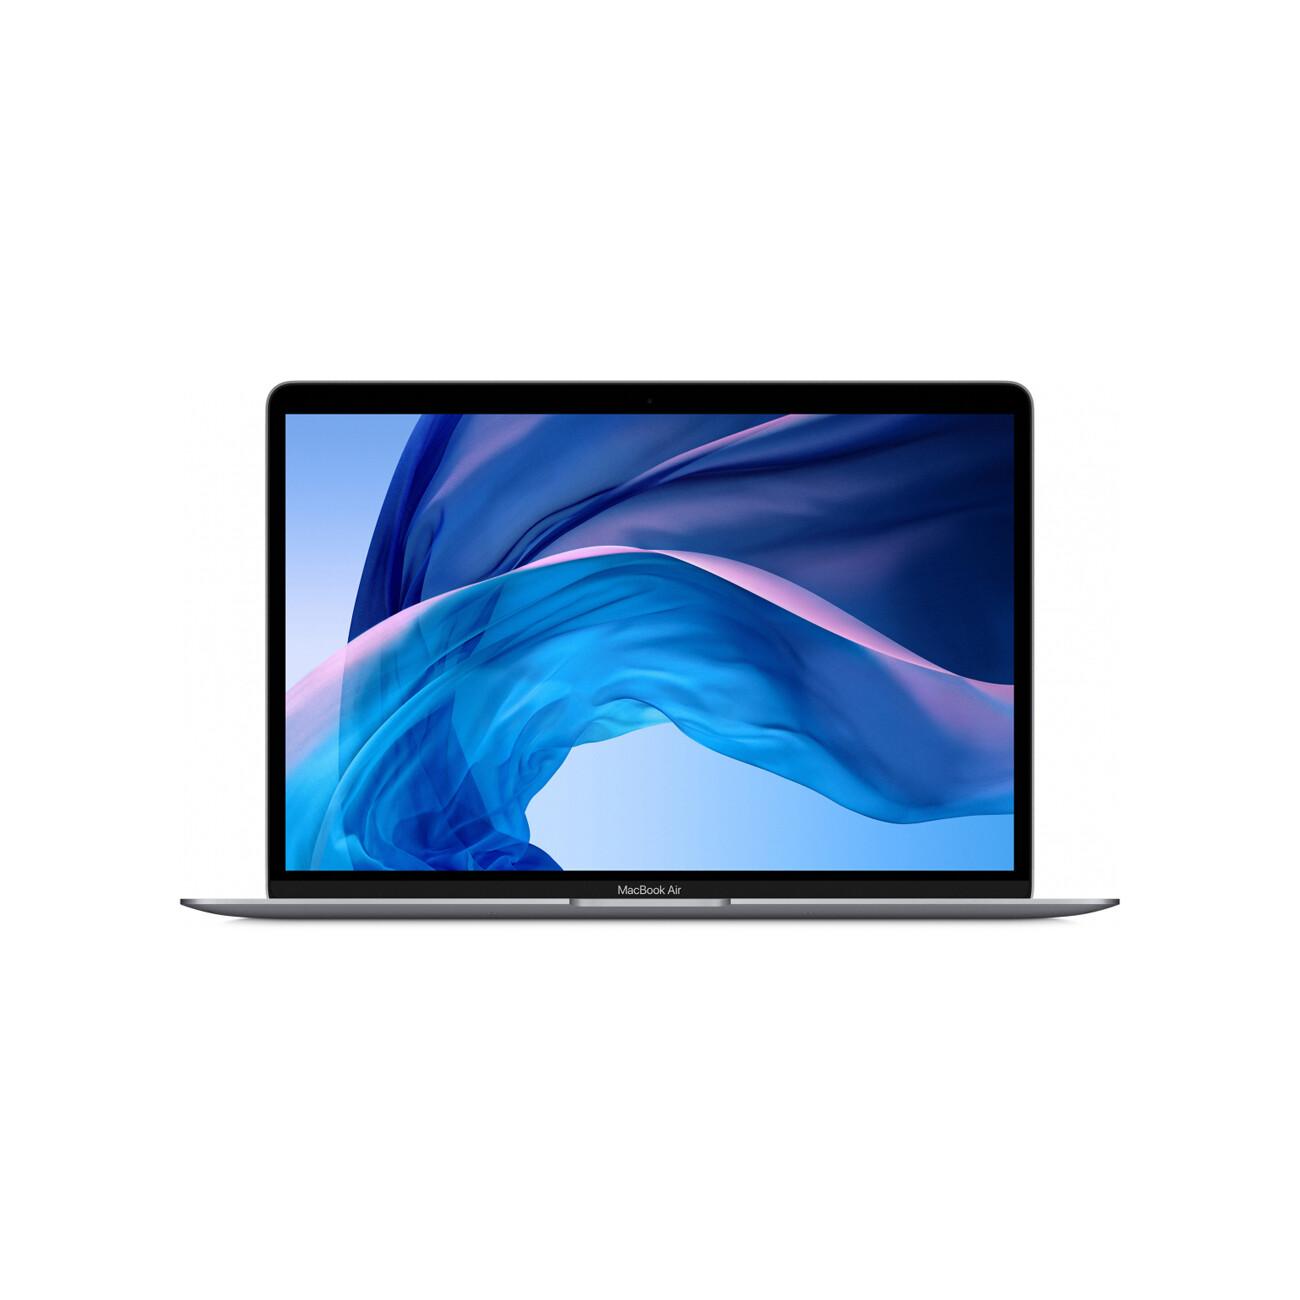 "Apple MacBook Air 13"" Quad Core i5 1,1 ГГц, 8 ГБ, 512 ГБ SSD, «серый космос»"